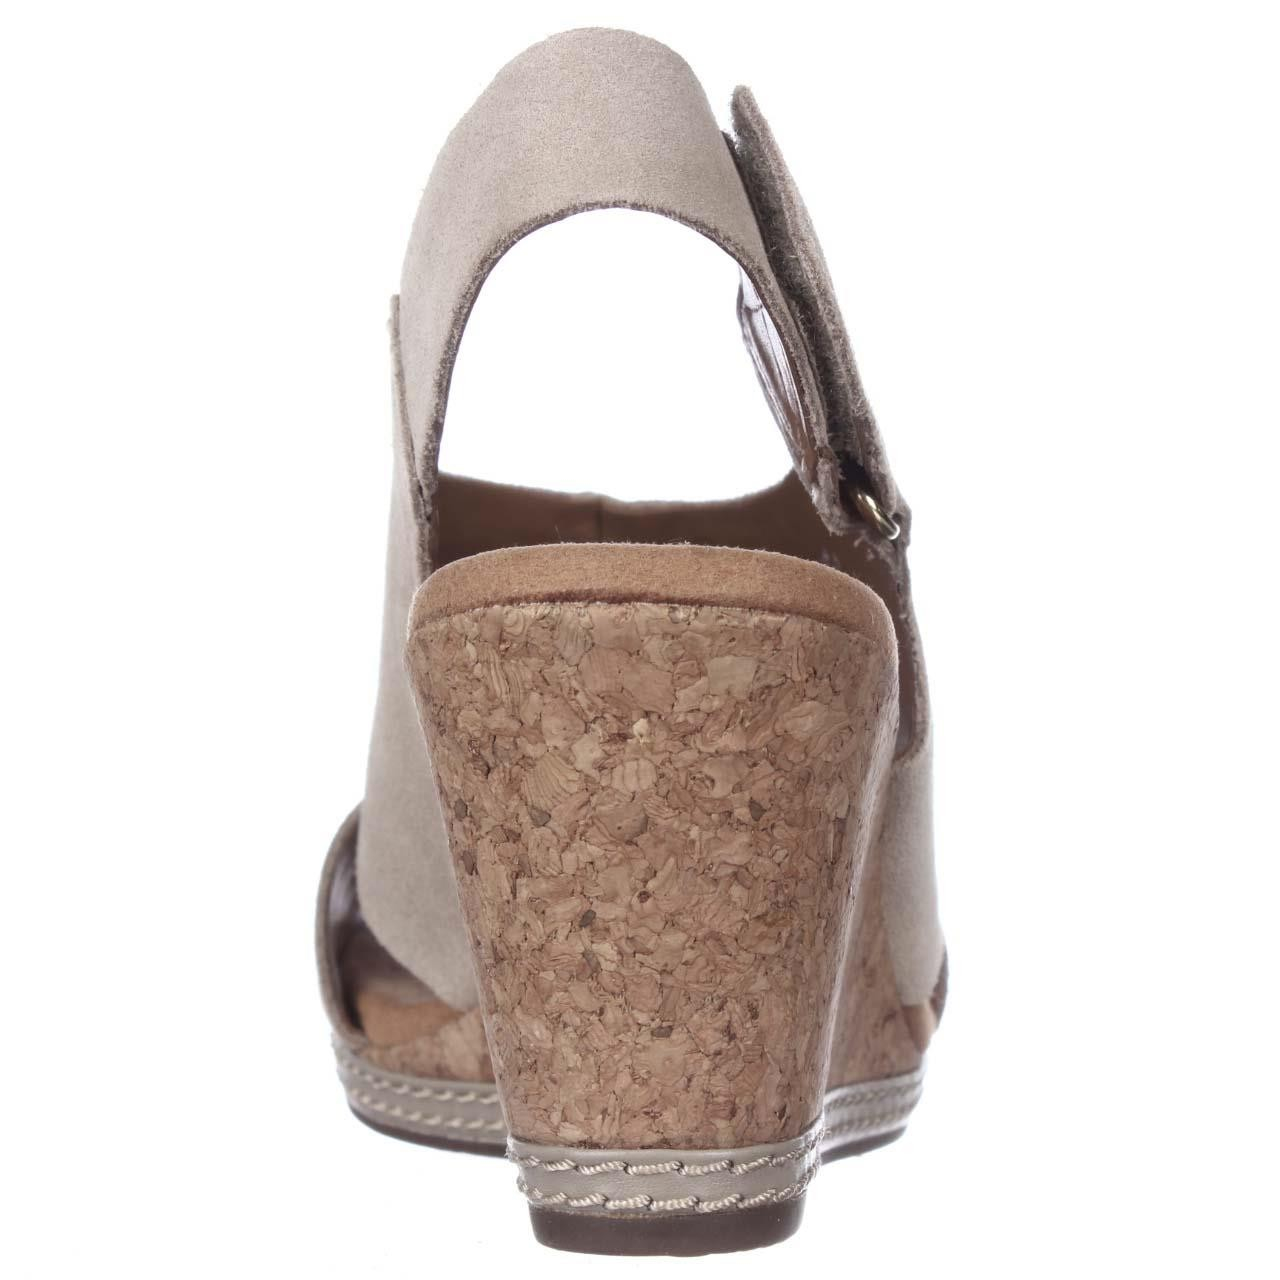 Clarks Helio Float4 Peep Toe Slingback Wedge Sandals In